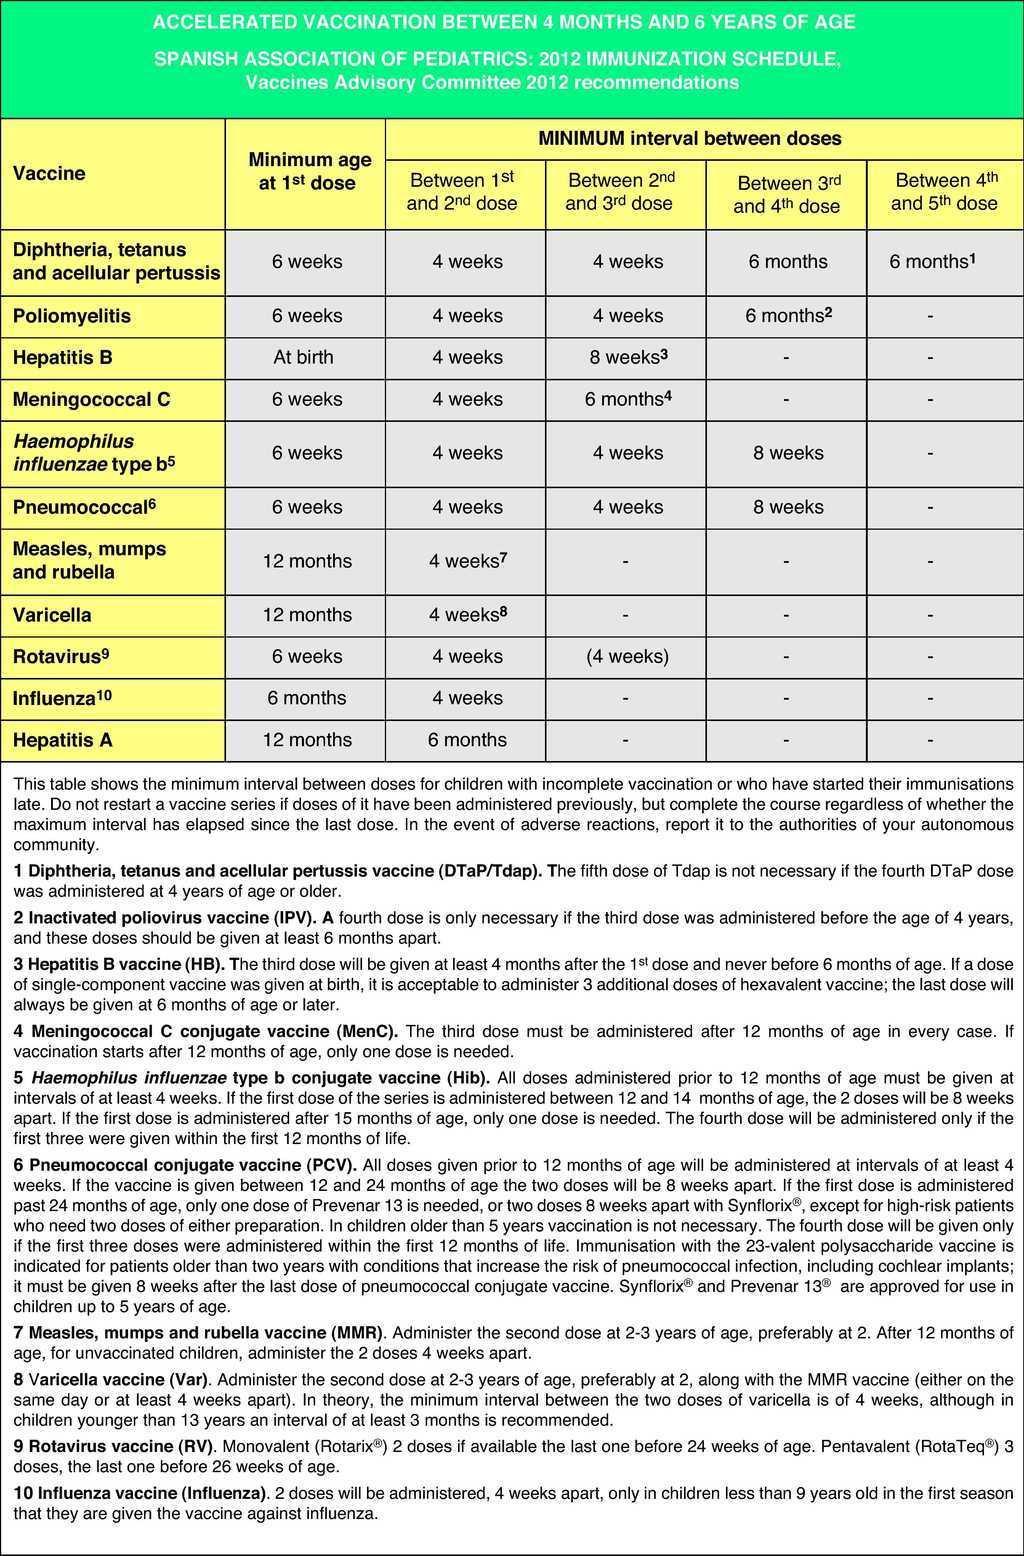 immunization schedule of the spanish association of pediatrics: 2012